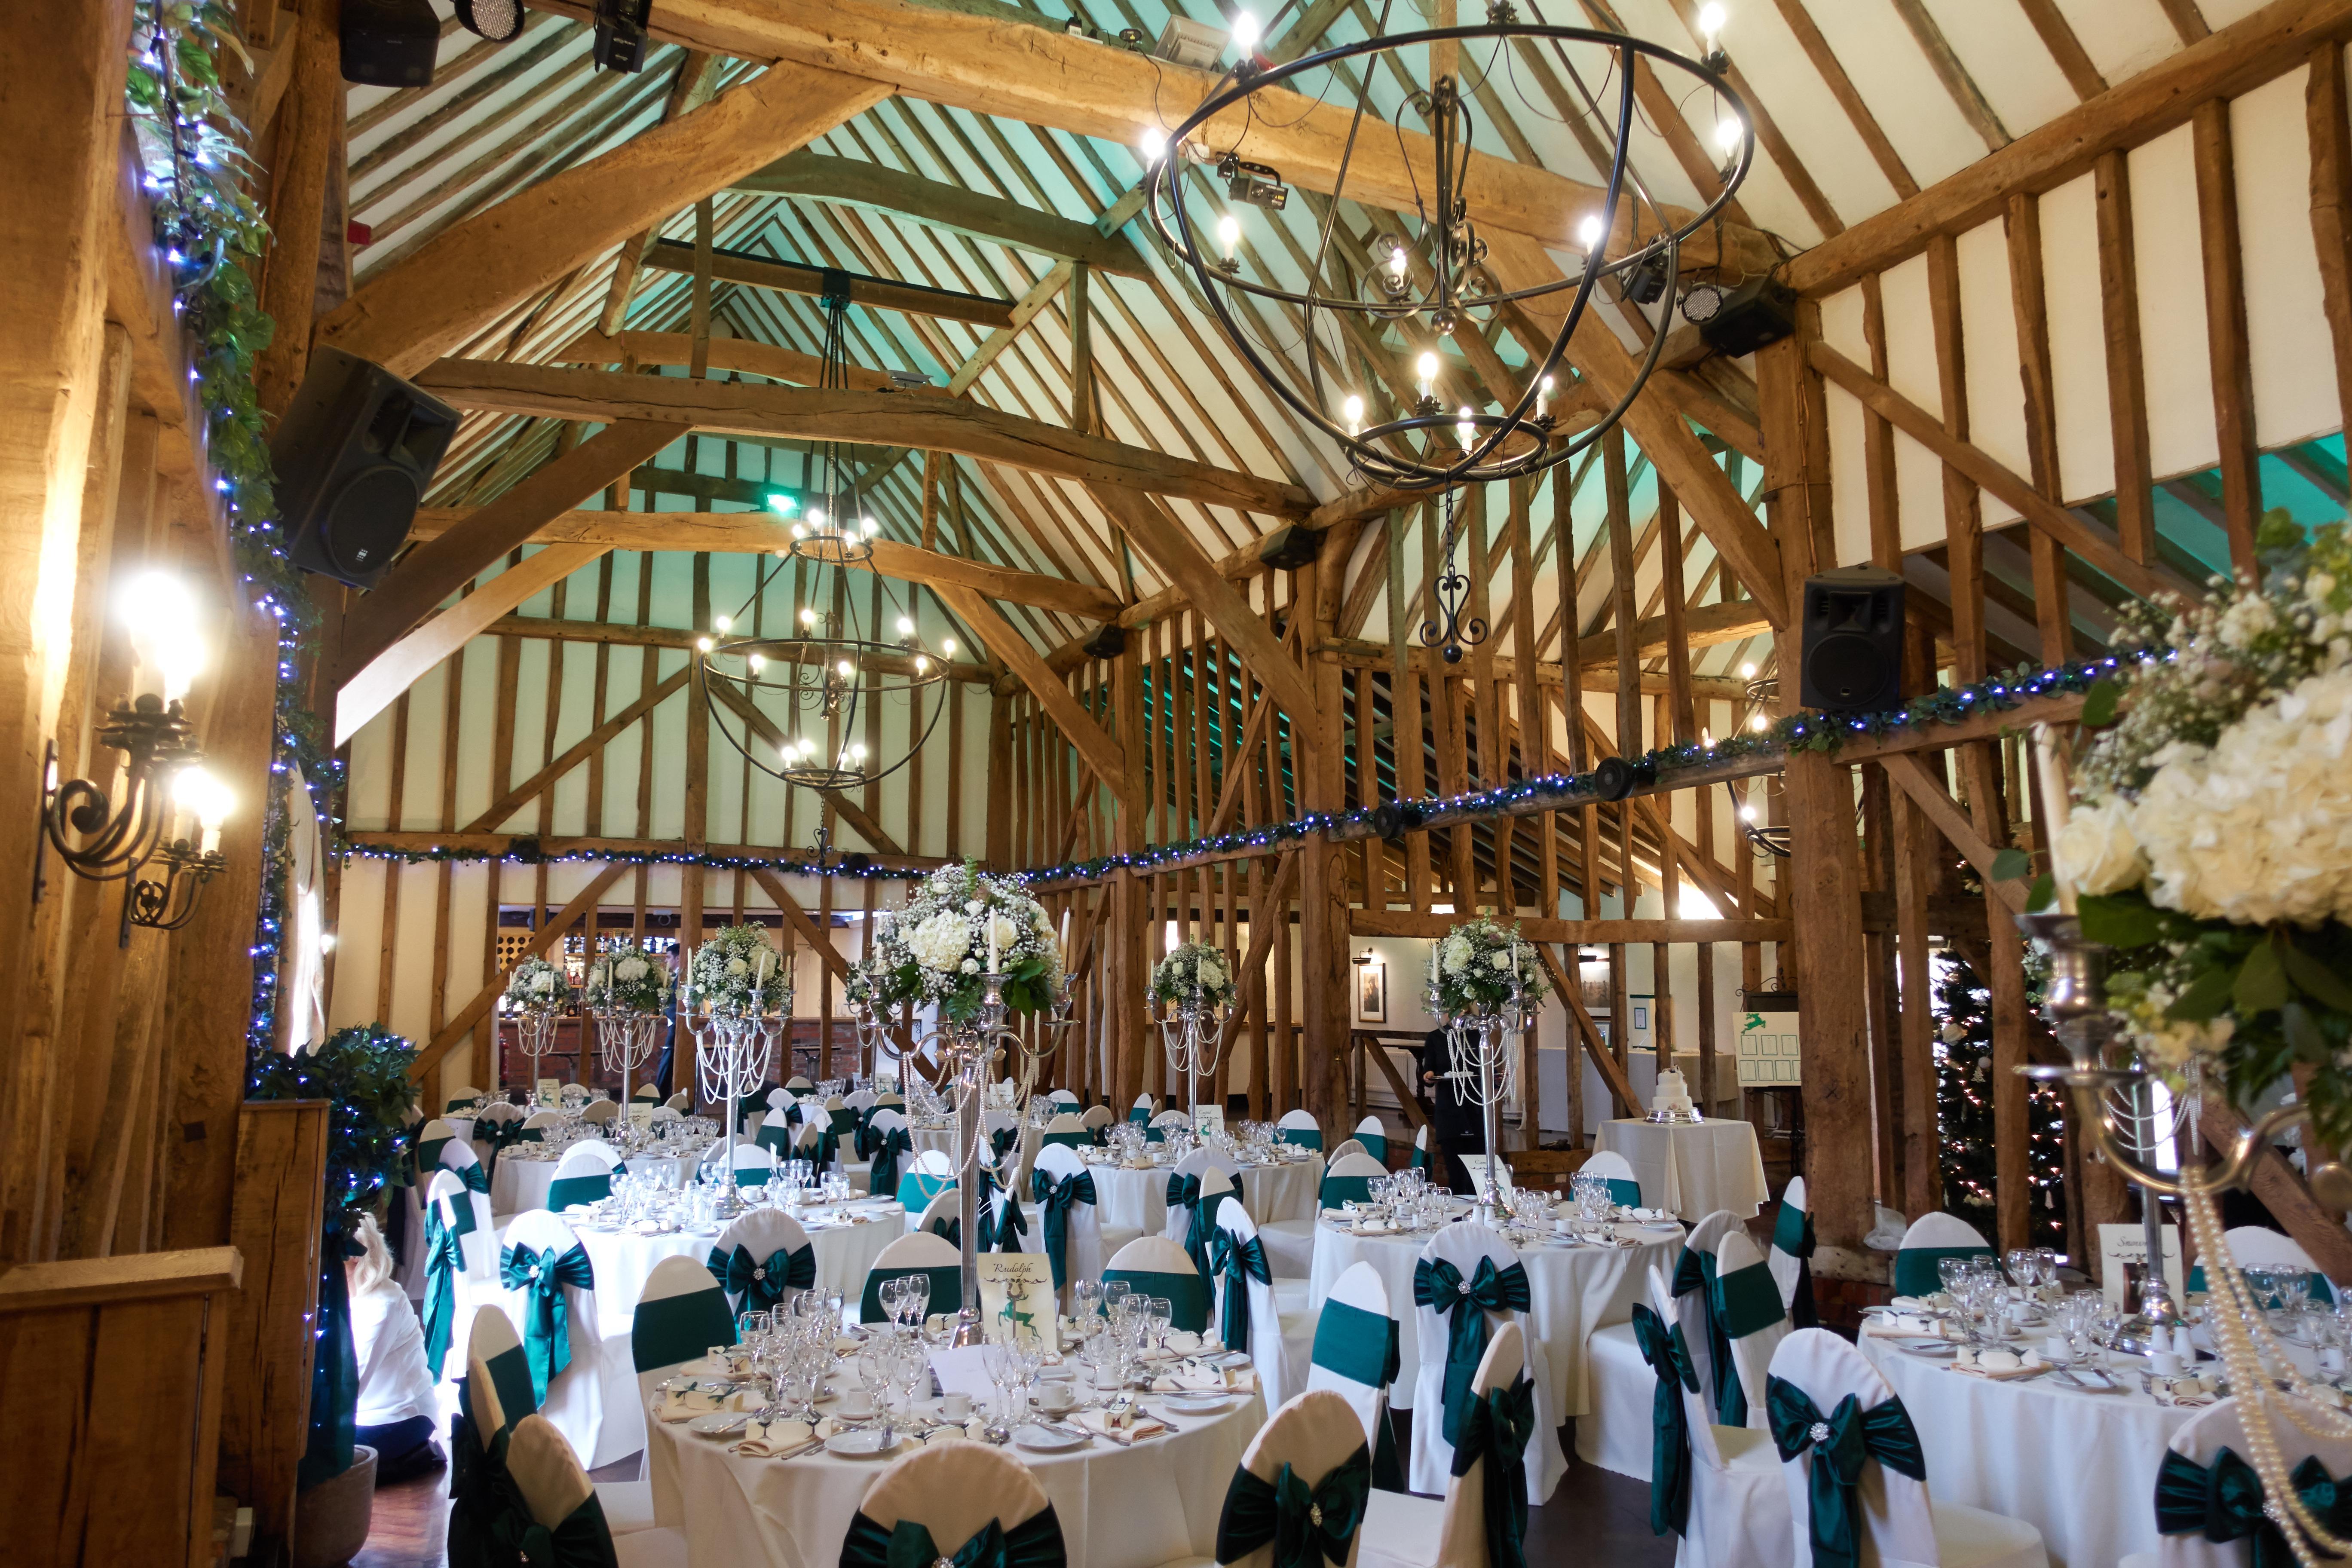 Why Are Barn Weddings So Popular?